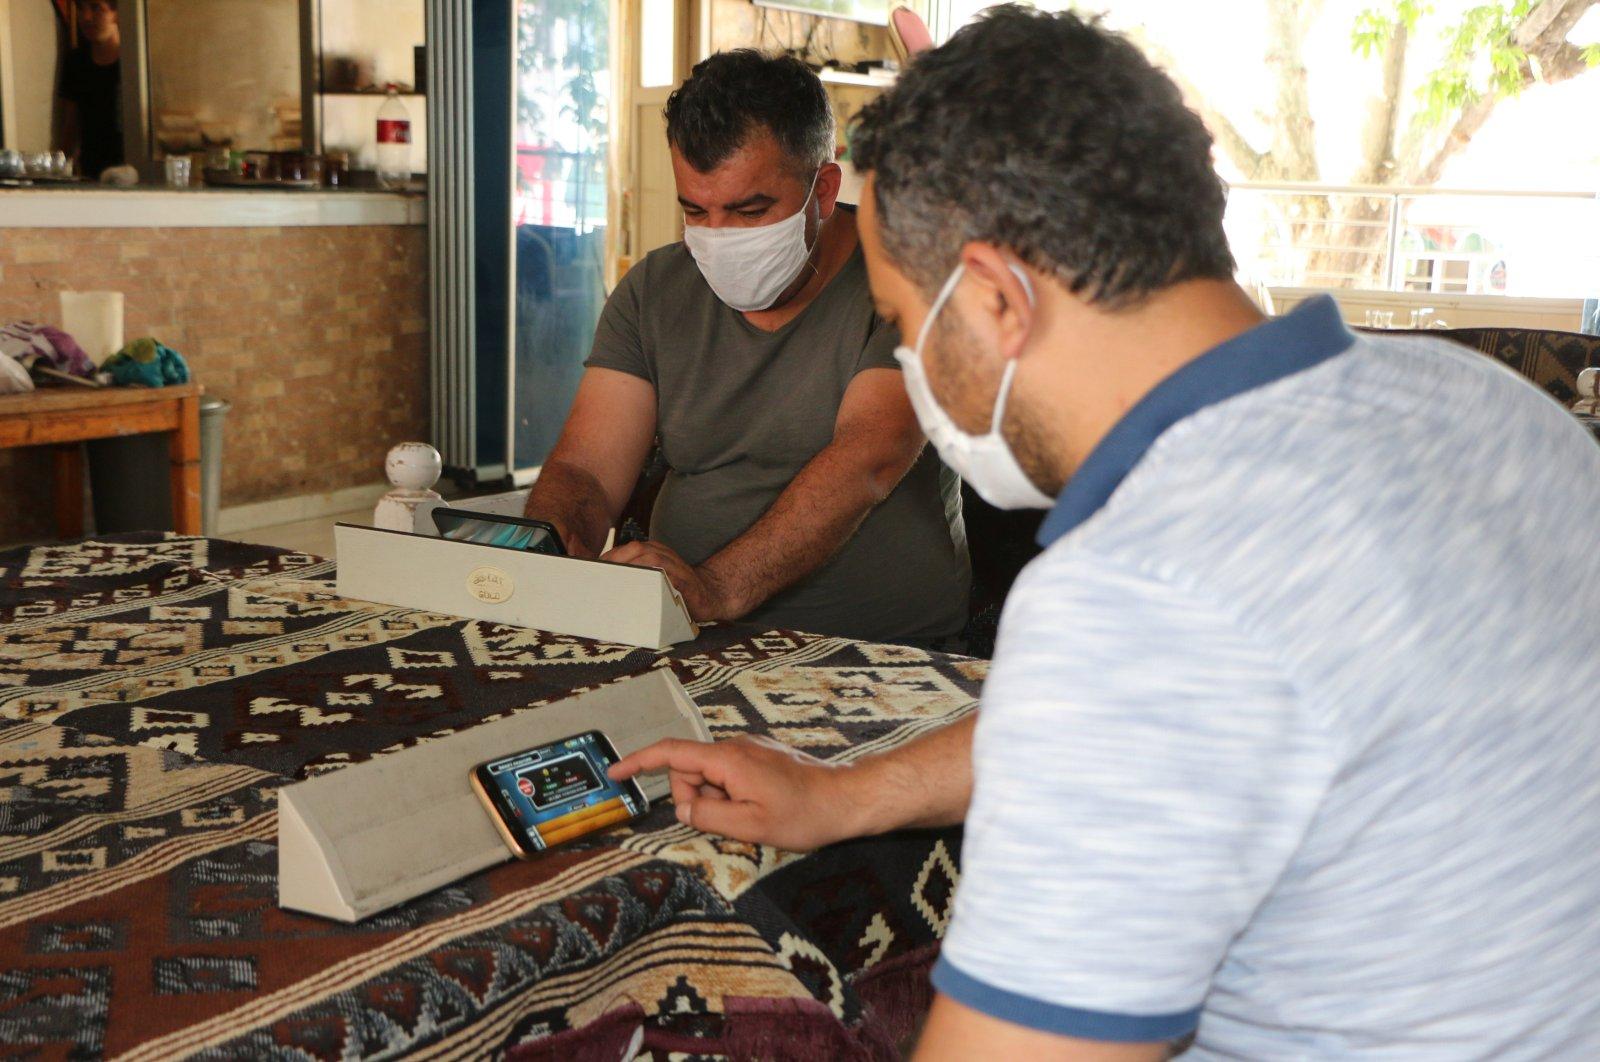 Customers play okey on their cellphones in Adıyaman, Turkey, June 2, 2020. (DHA Photo)